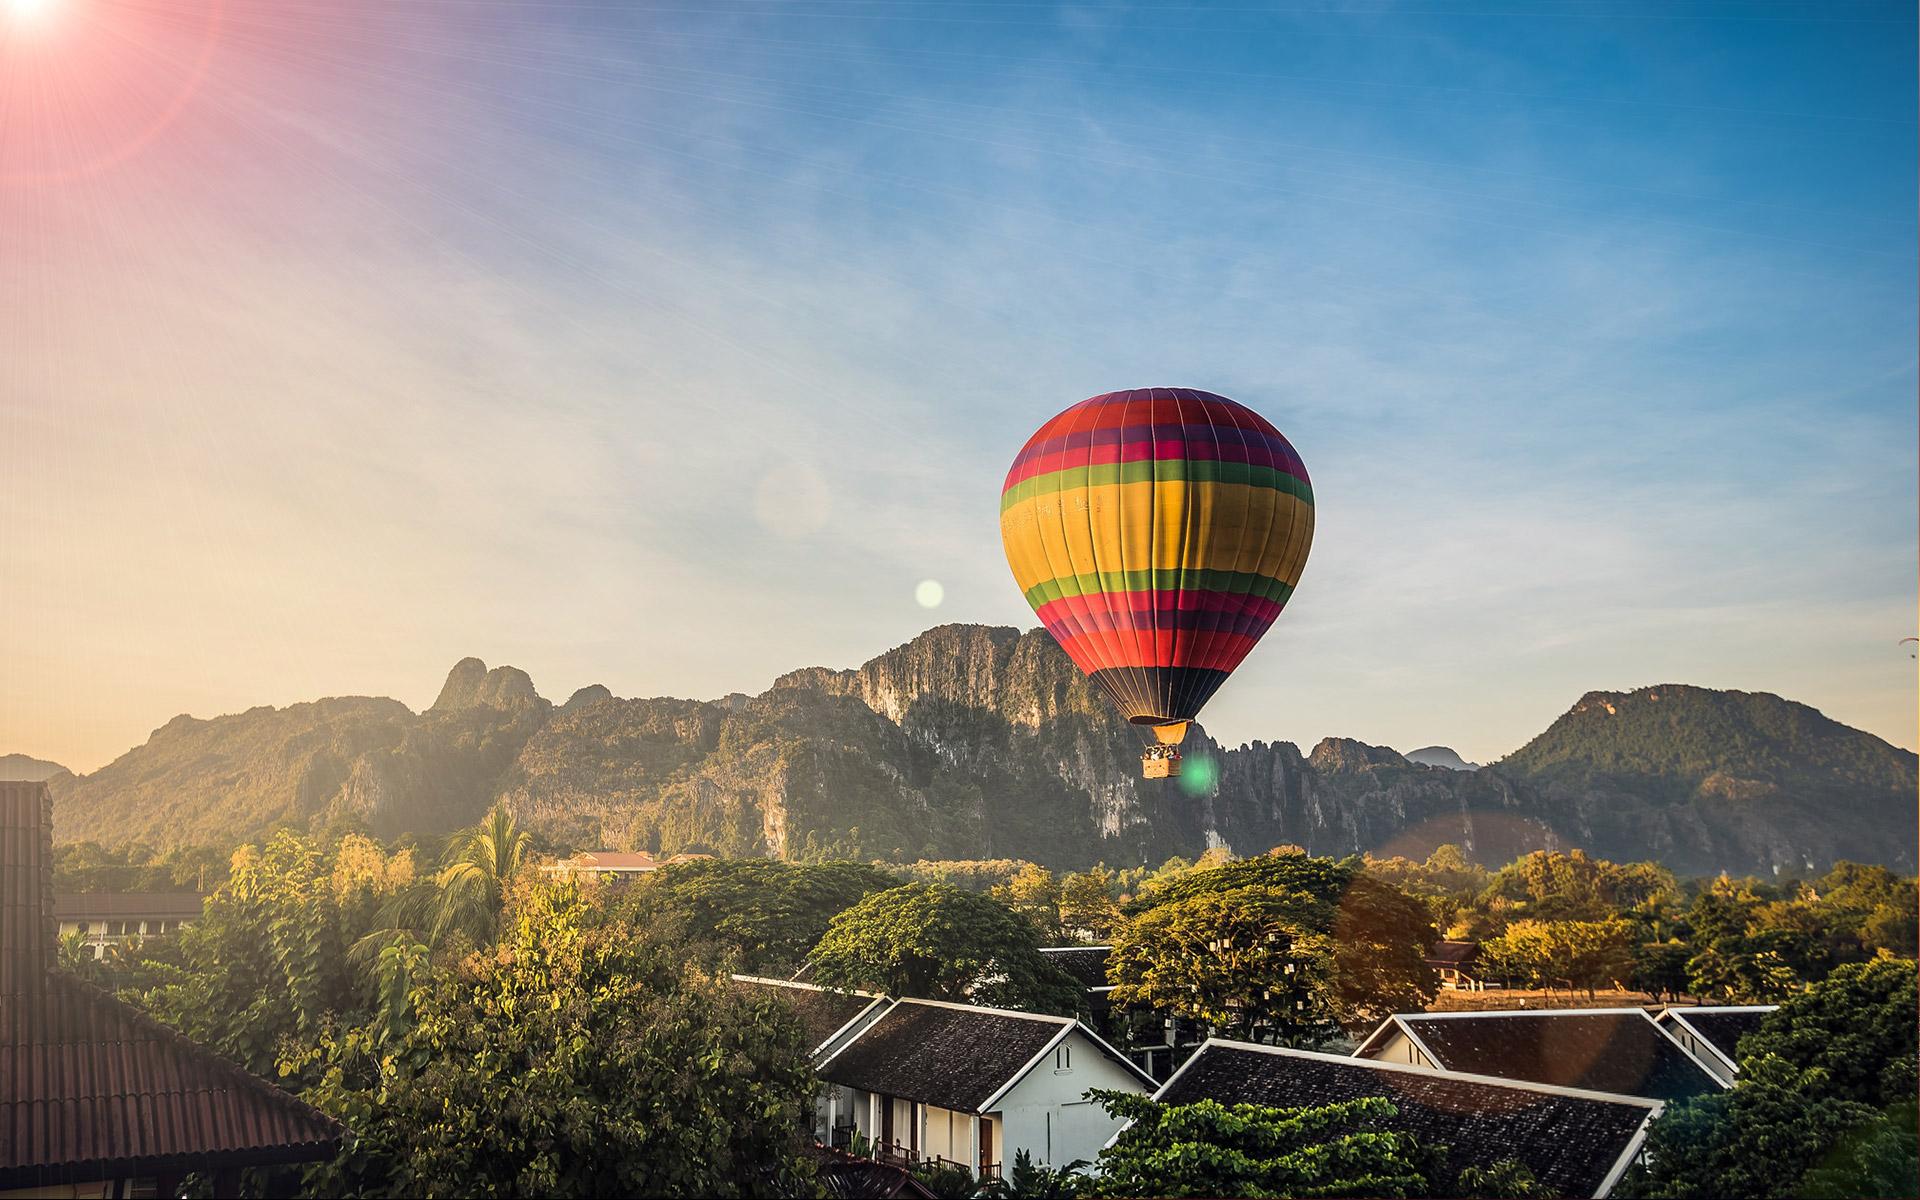 Balloons in Vang Vieng